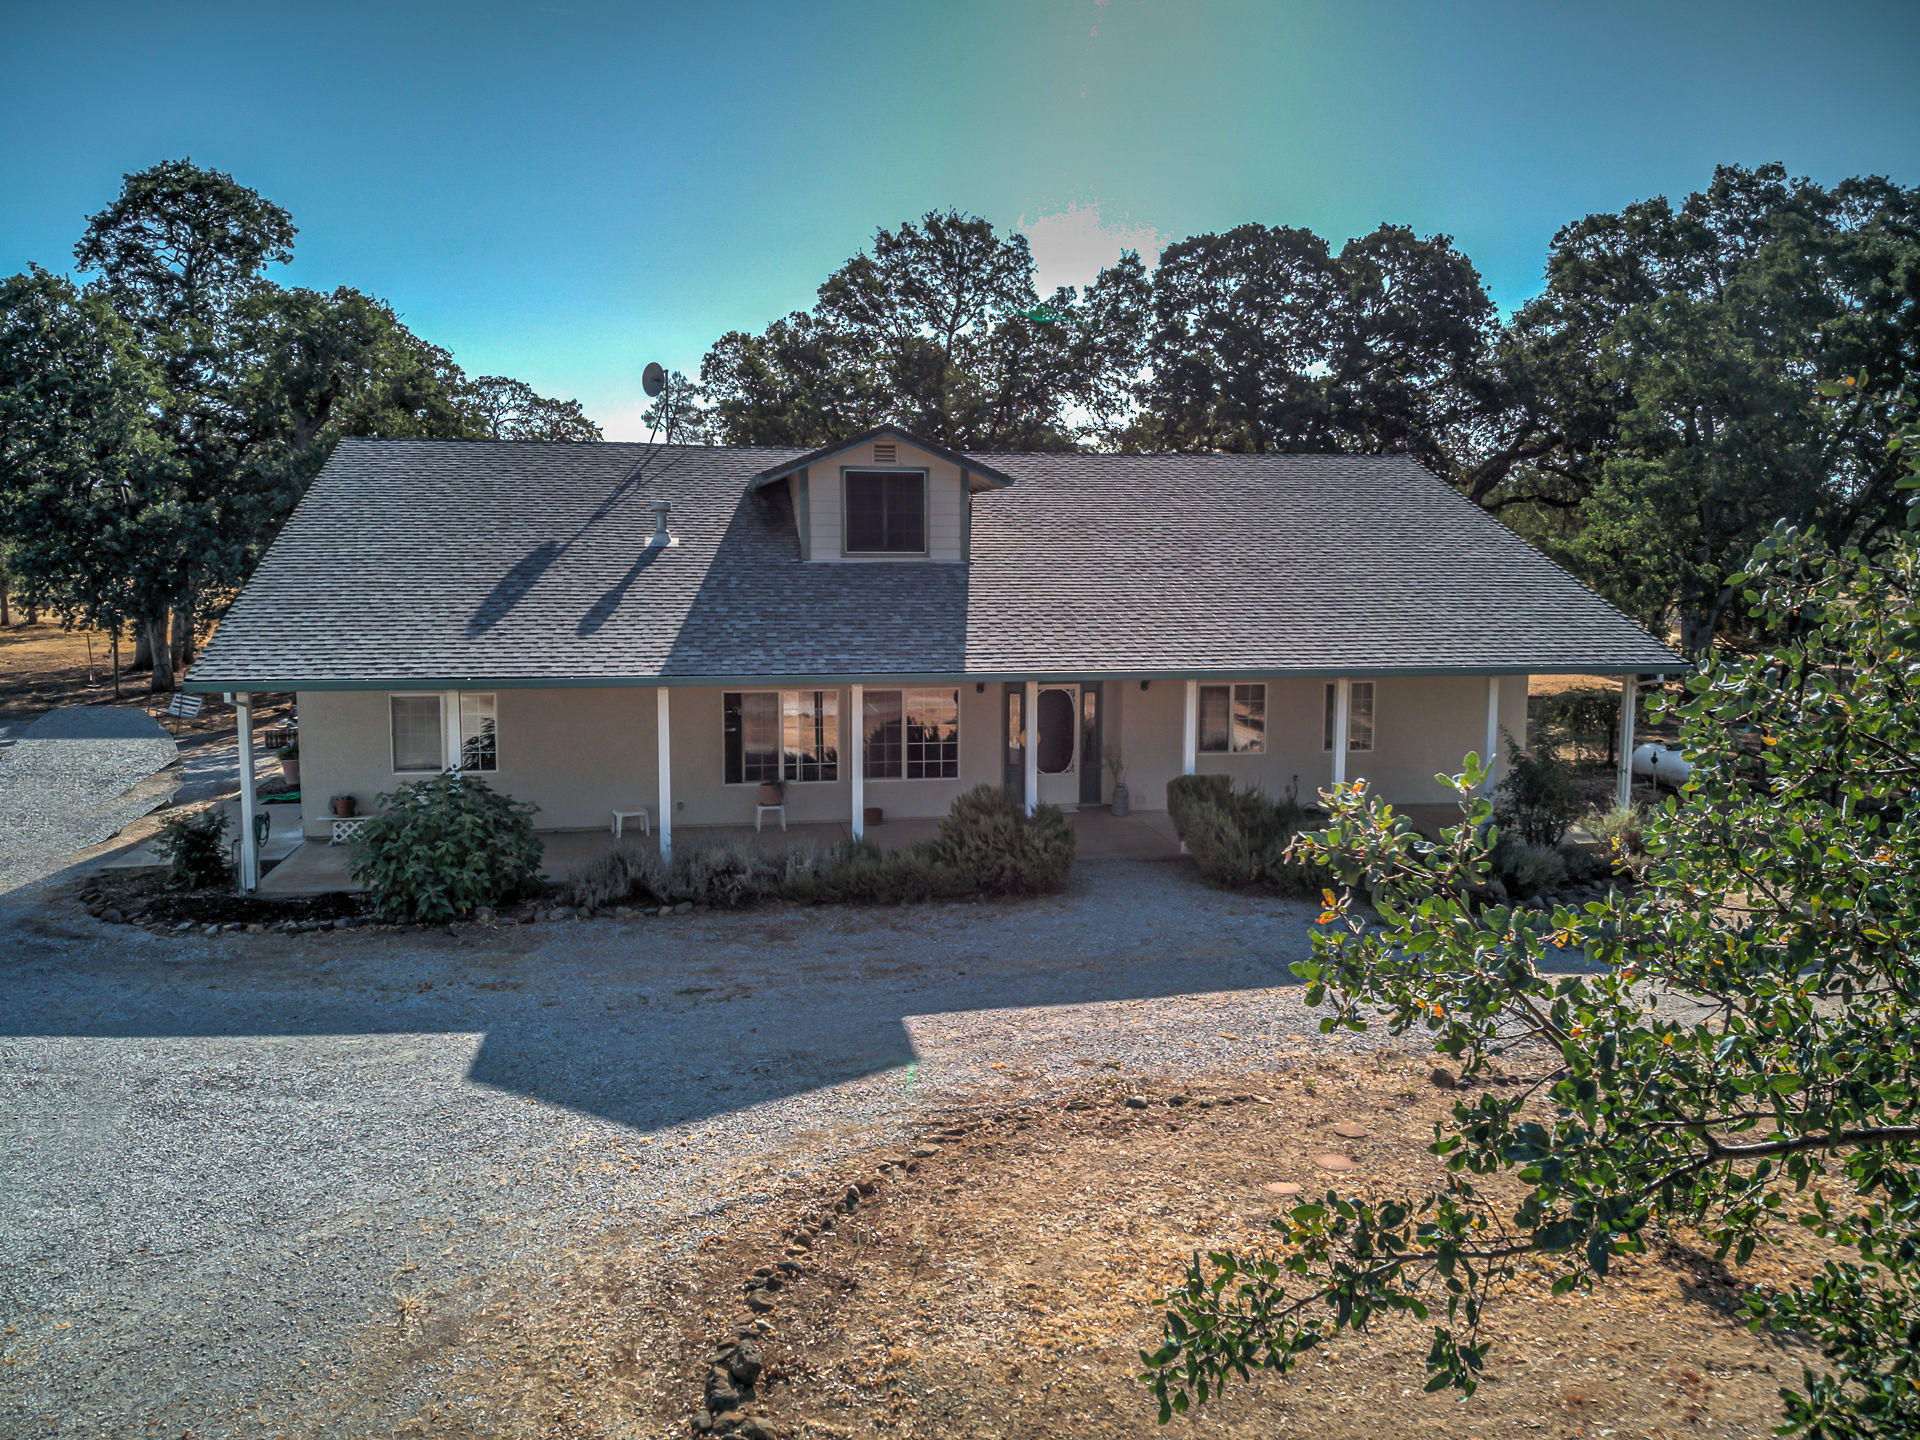 10075 Rocking Horse Ln, Redding, CA.| MLS# 19-4256 | Jennifer Parke ...